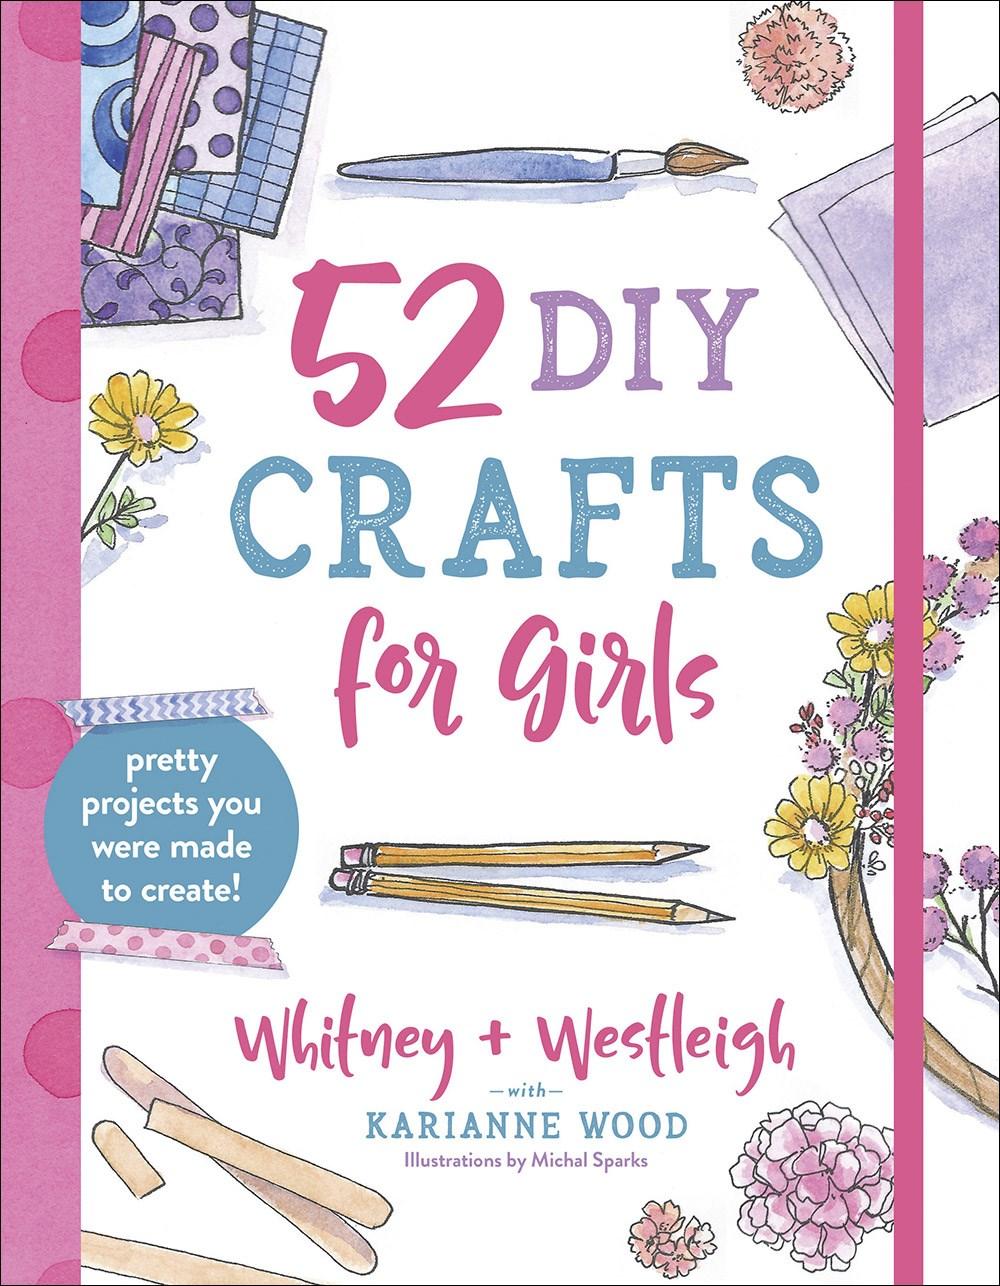 52 DIY Crafts For Girls